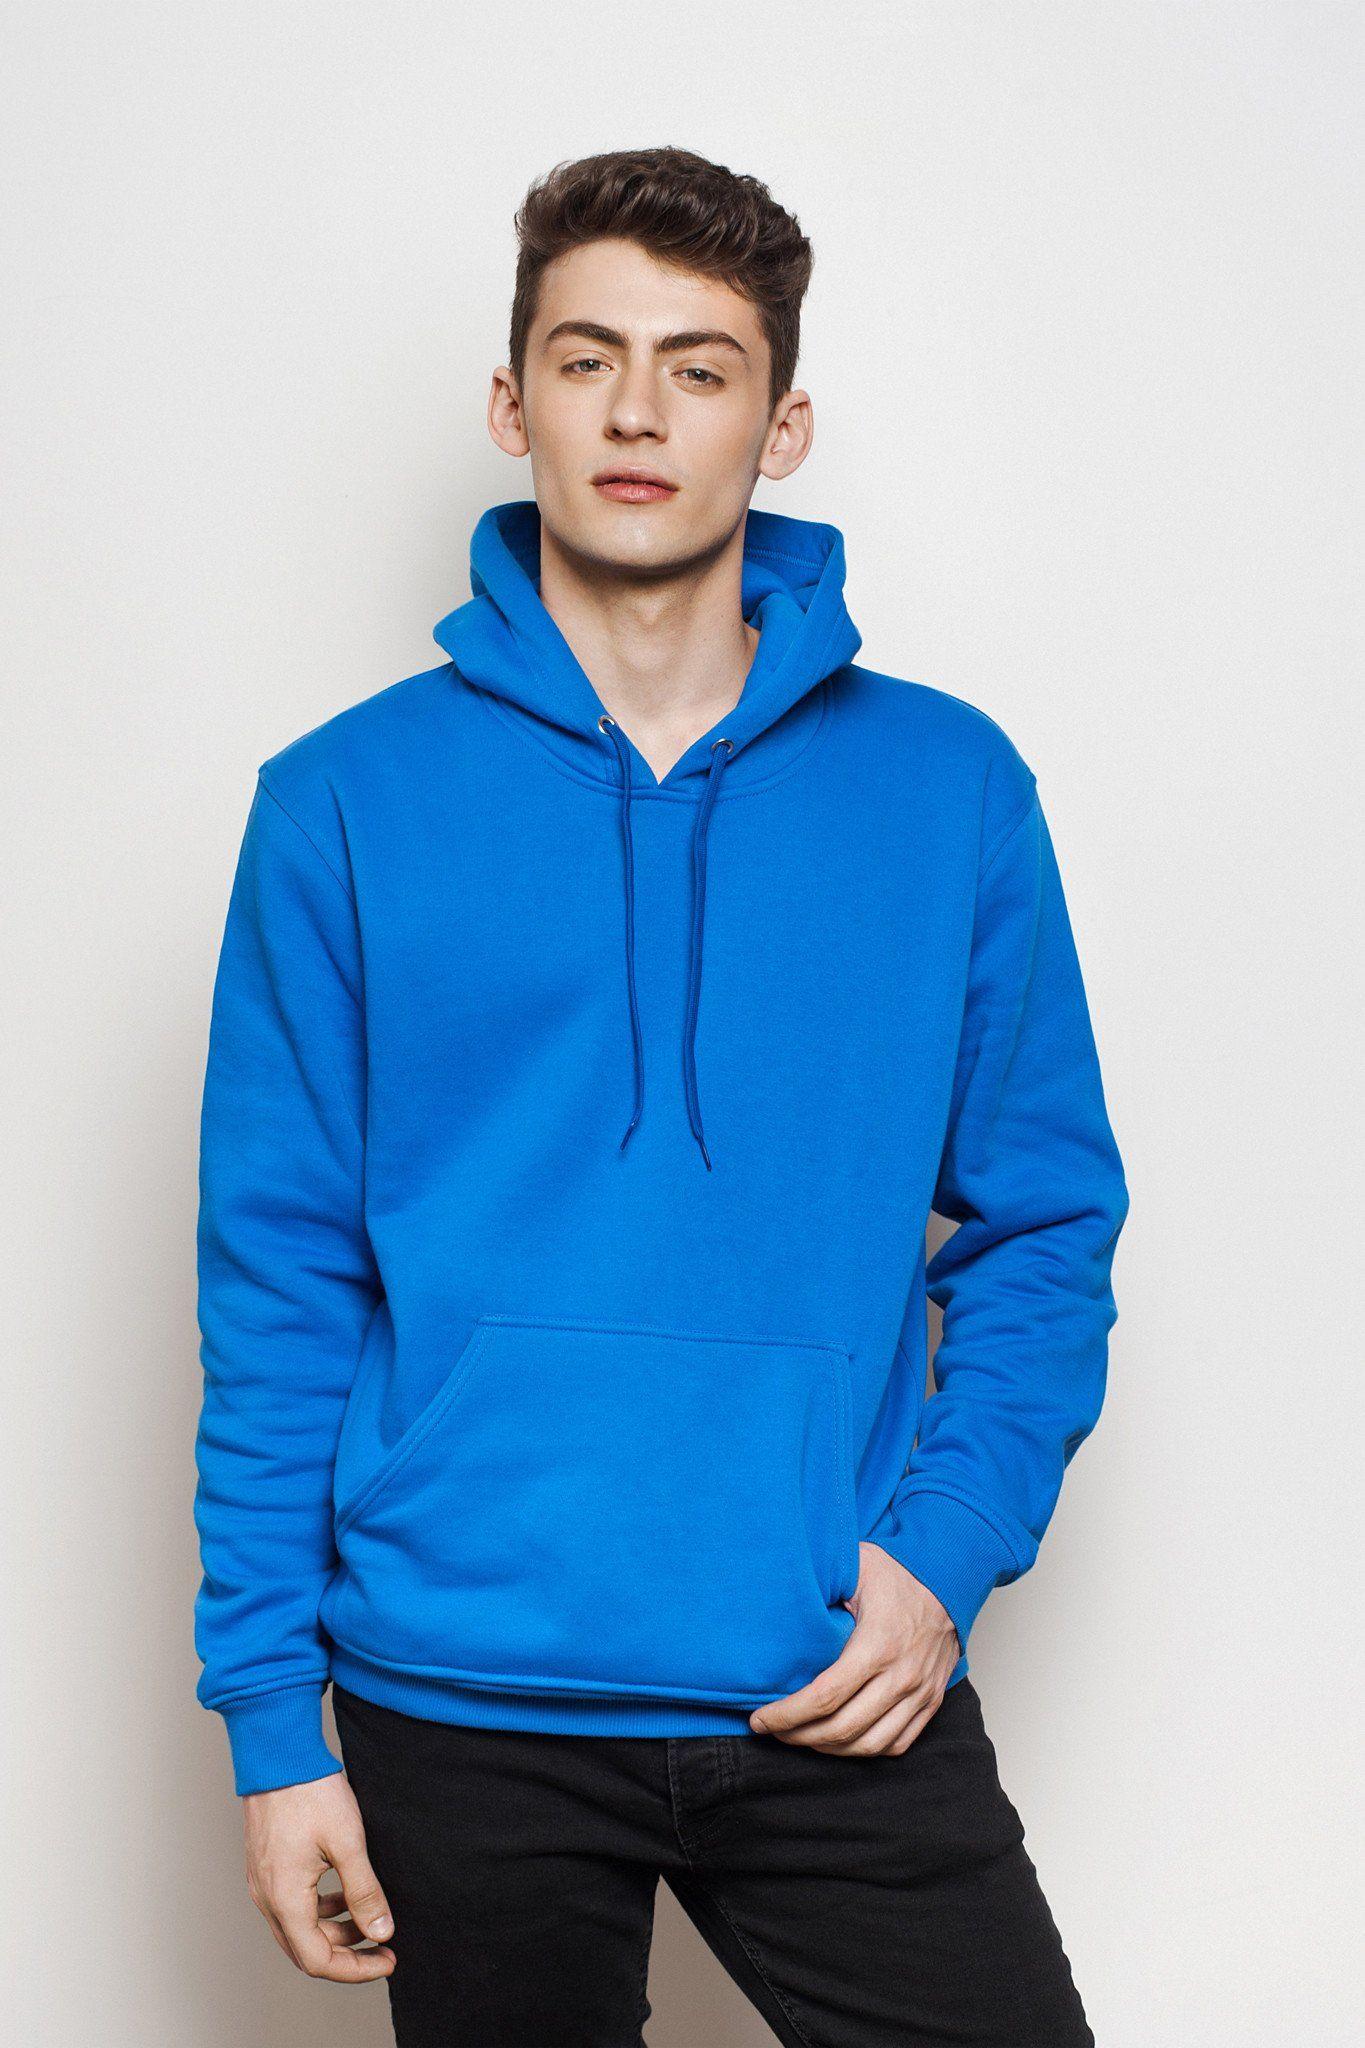 Christmas 2020 Ideas For College Men HERO 2020 Unisex Hoodie   Royal Blue | Xmas gift ideas | Hoodies